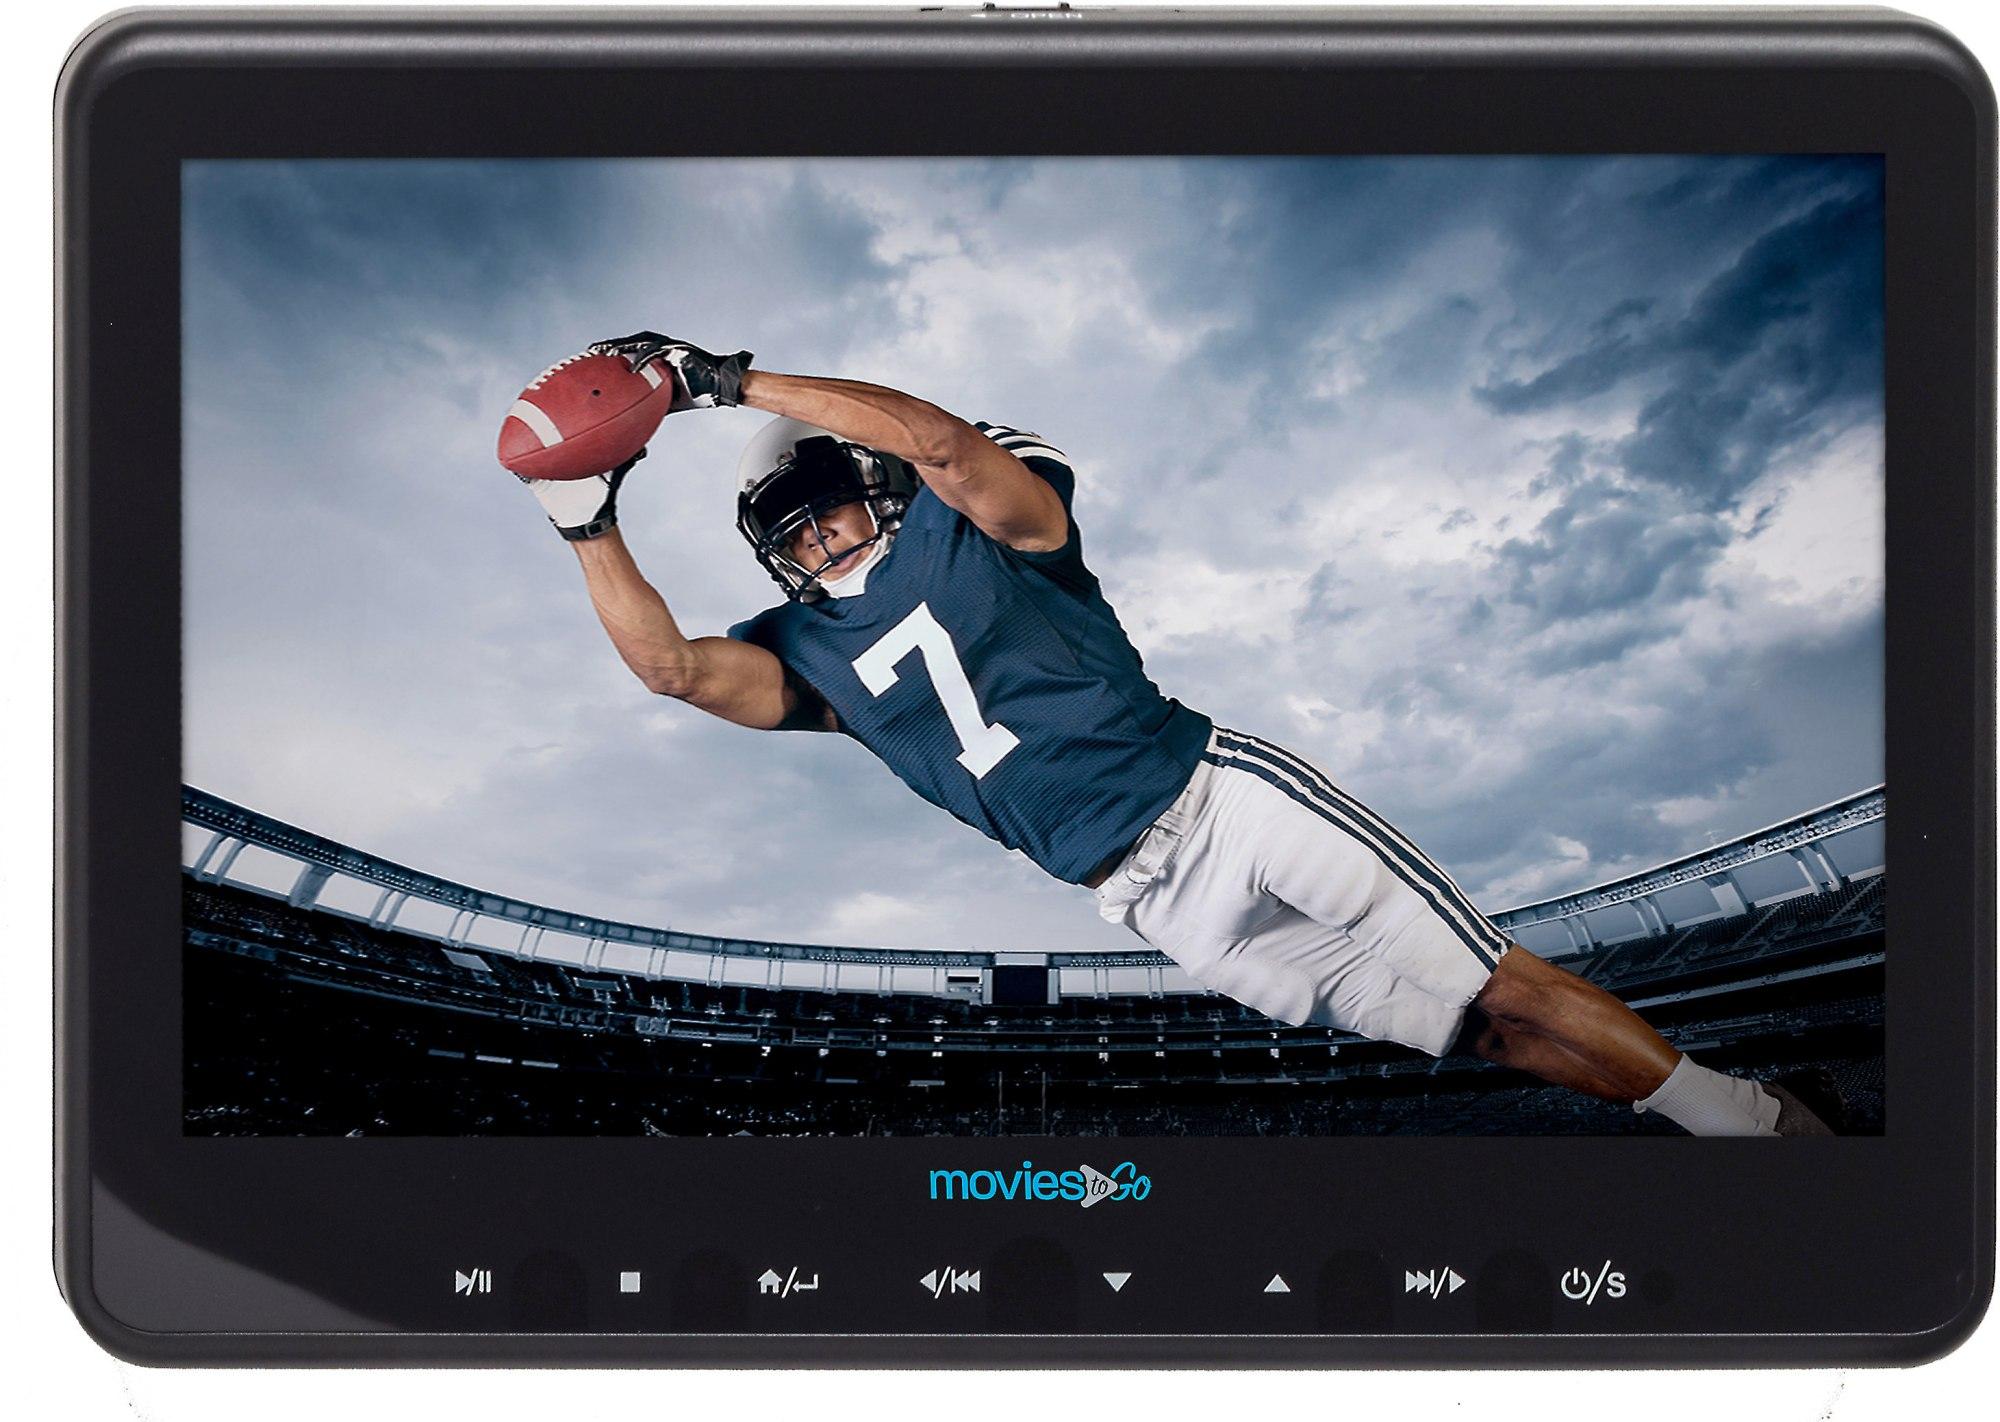 hight resolution of audiovox avx10usb 10 1 high resolution headrest monitor with dvd player at crutchfield com